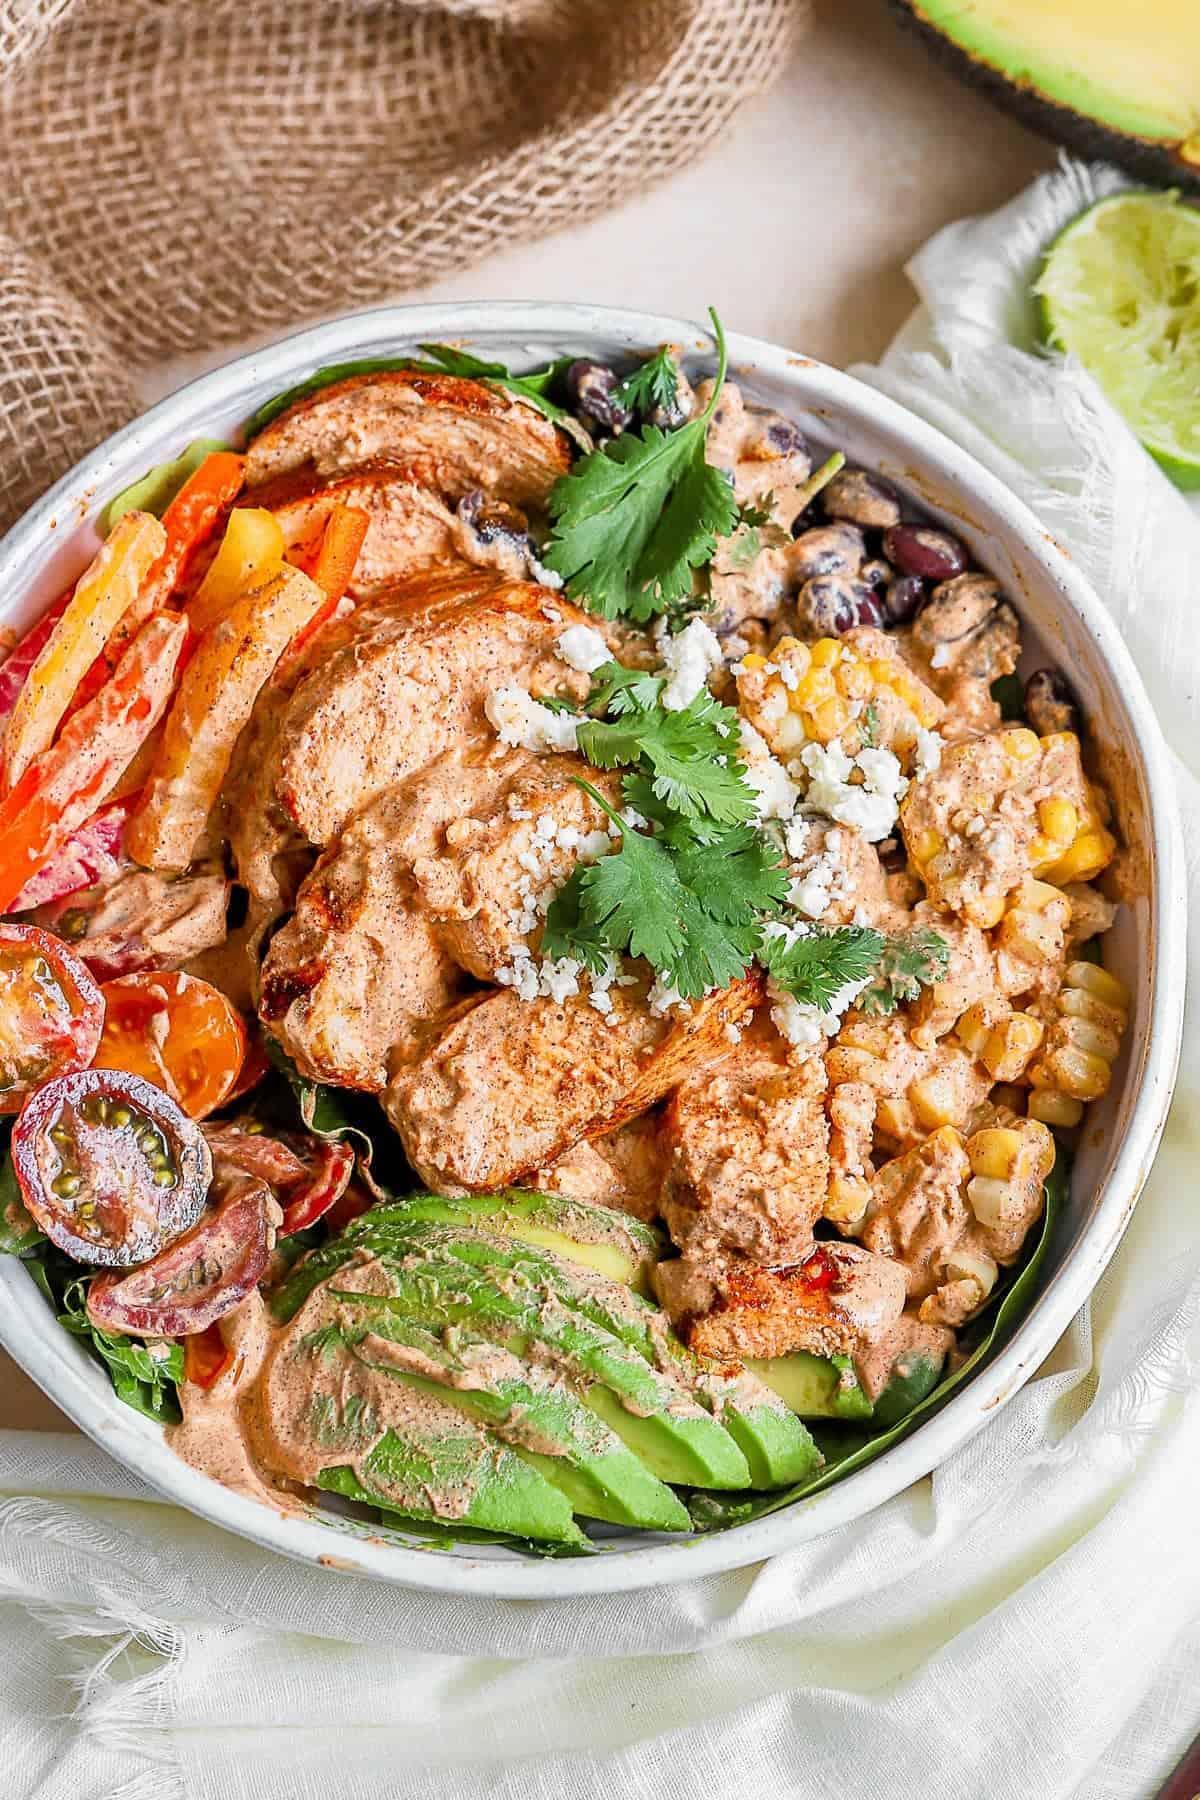 A finished Southwest Chicken Salad bowl with fresh garnish